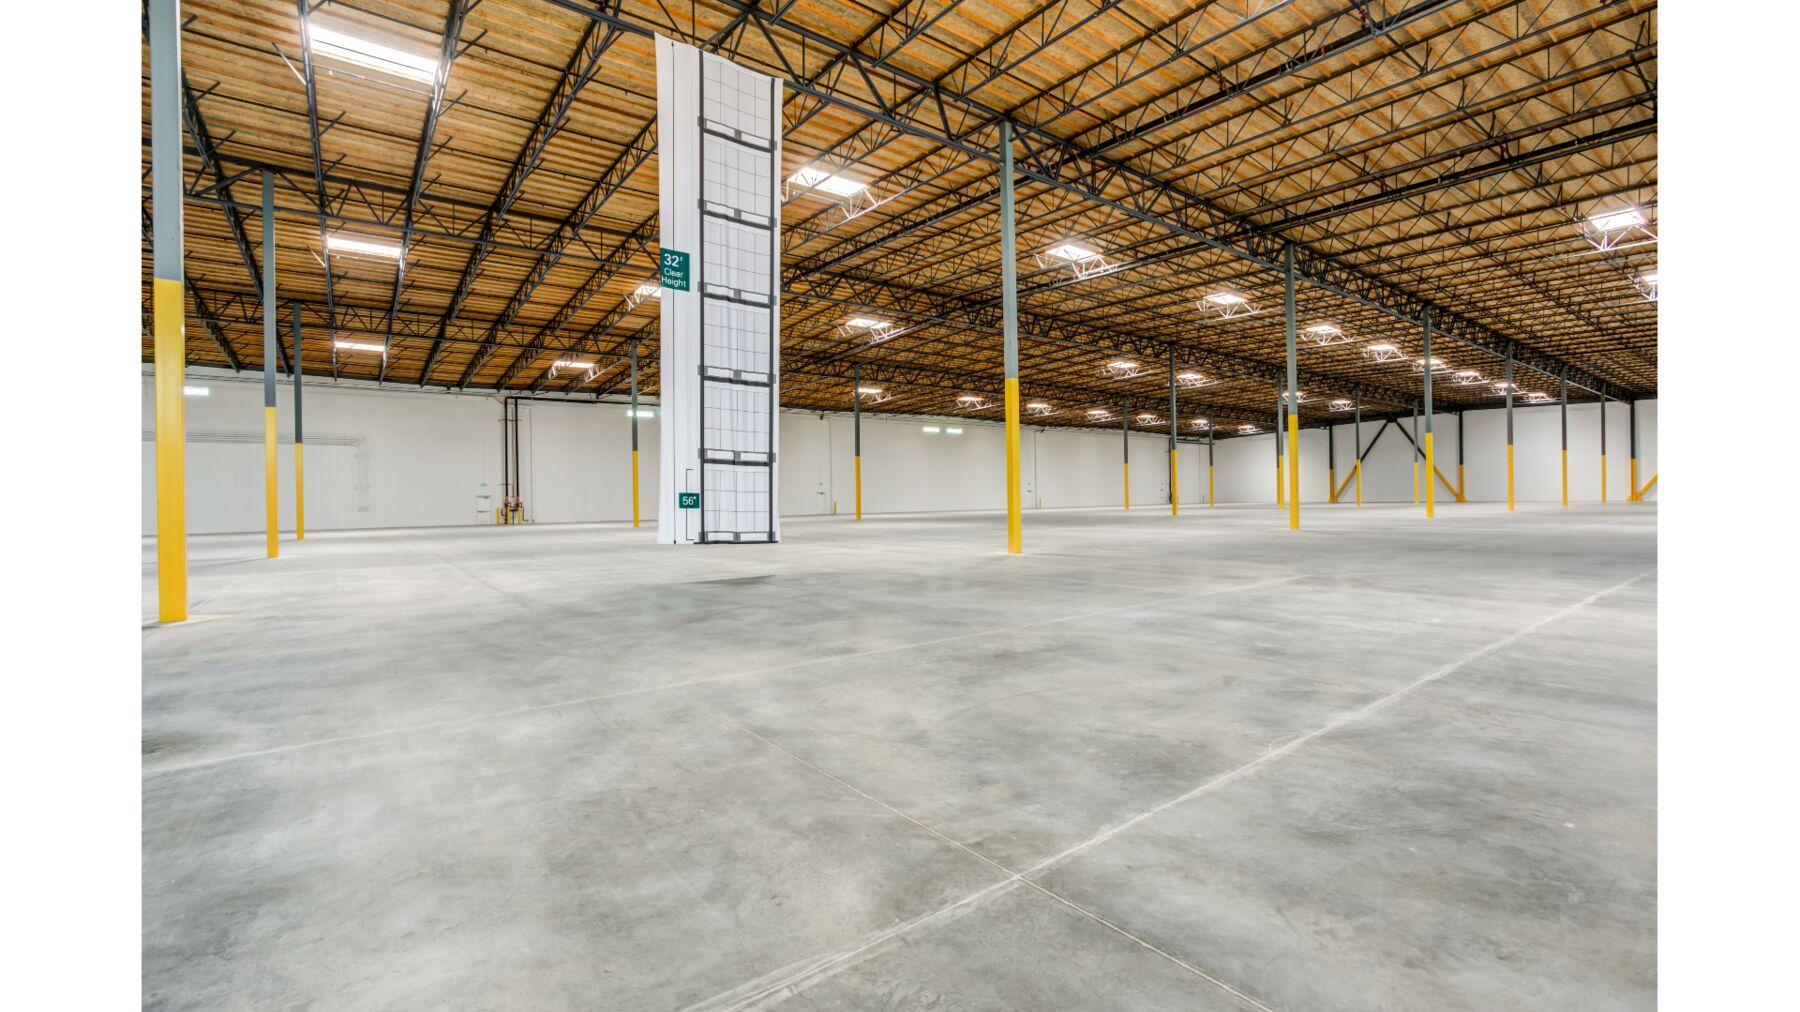 DPM-Prologis-Oakland-Global-Logistics-Ctr-2-4.jpg